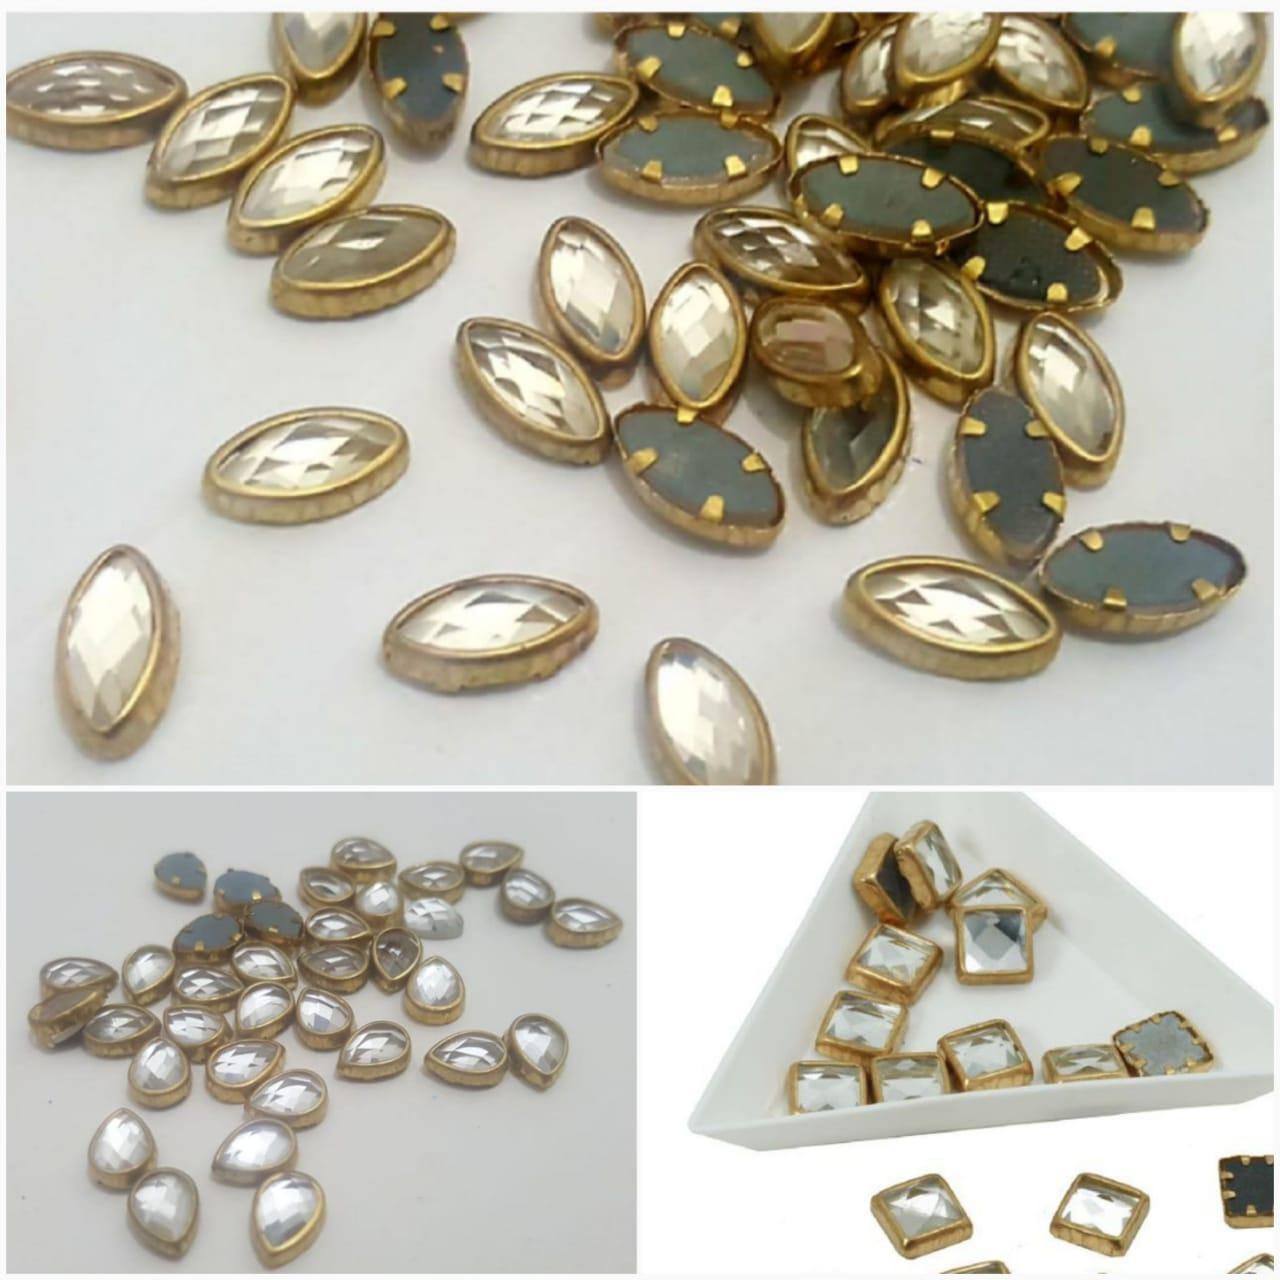 30 Pcs,  Real Kundan Beads DIY Sewing Jewelry Decoration Size Leaf Shape/(10x5mm) square shape(5x5mm) tear eye shape(7x5mm)